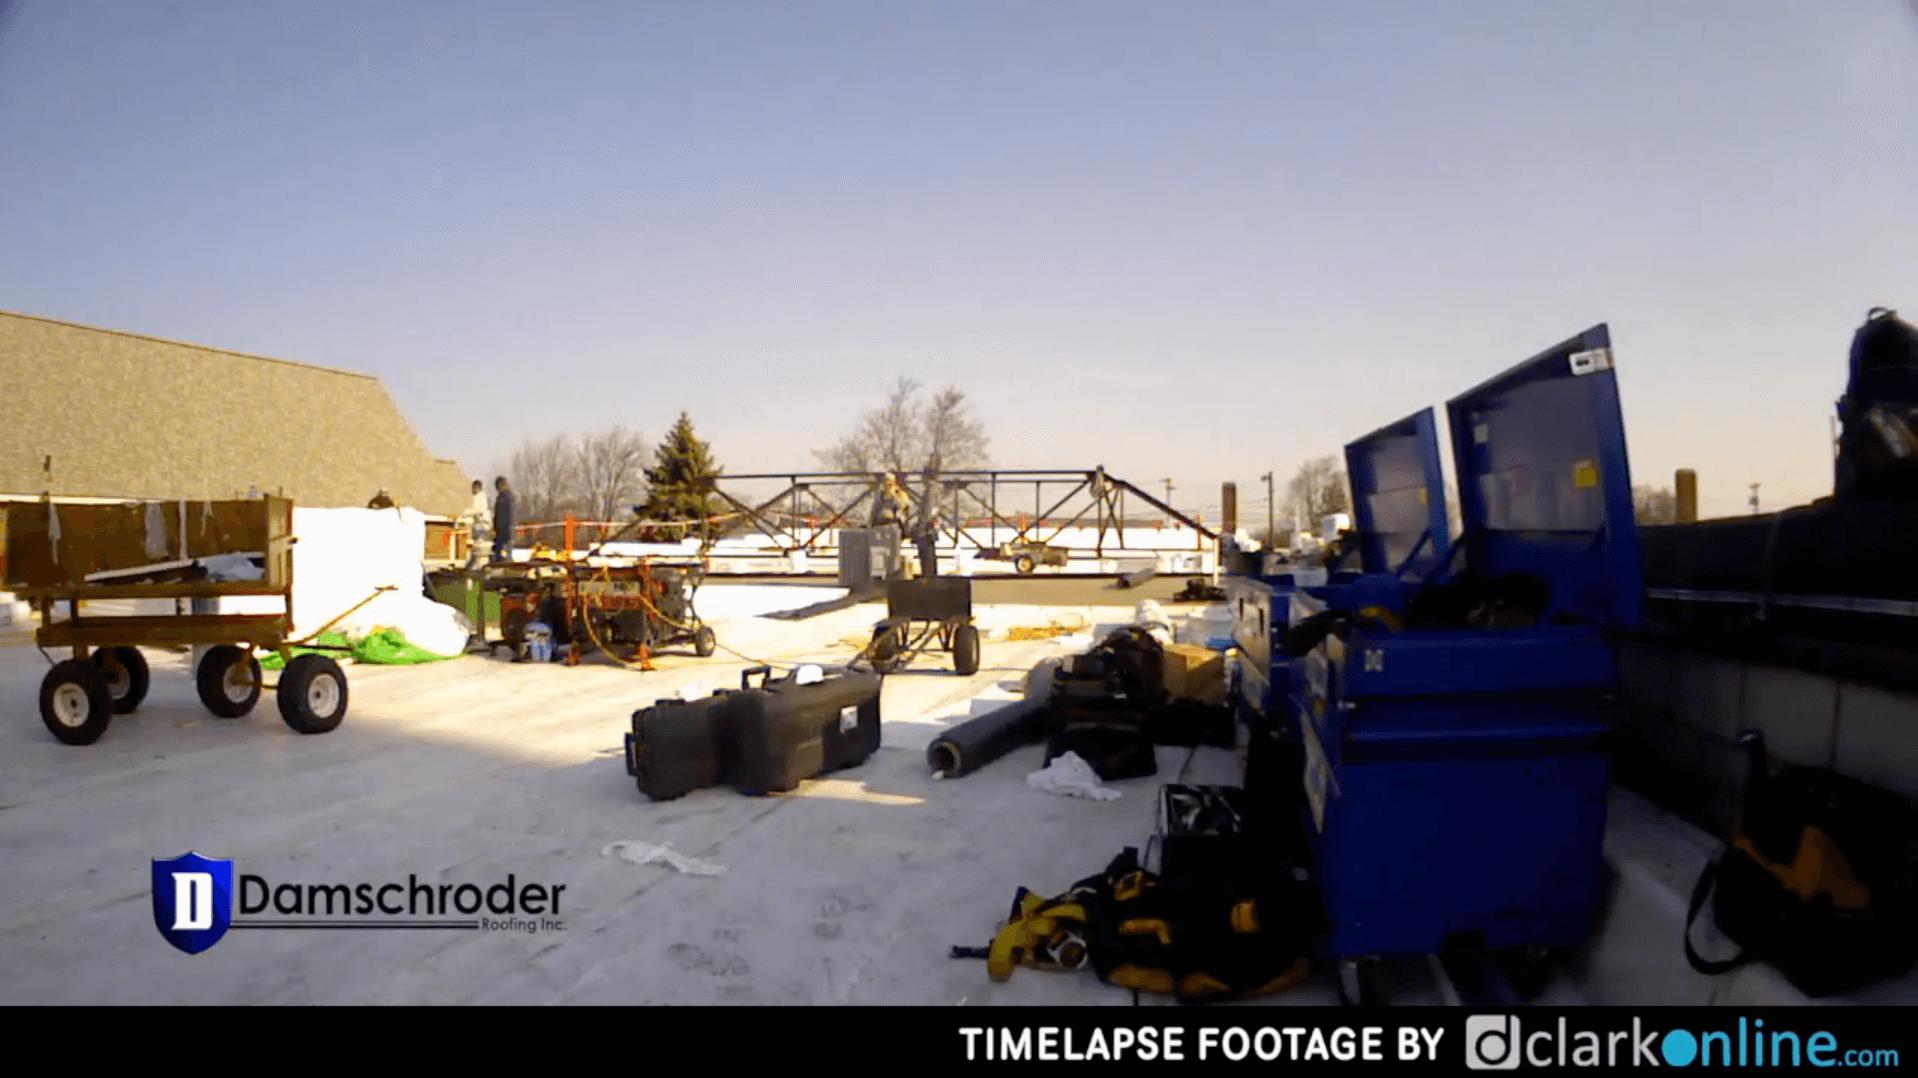 Gibsonburg CVS Damschroder Roofing Timelapse Video